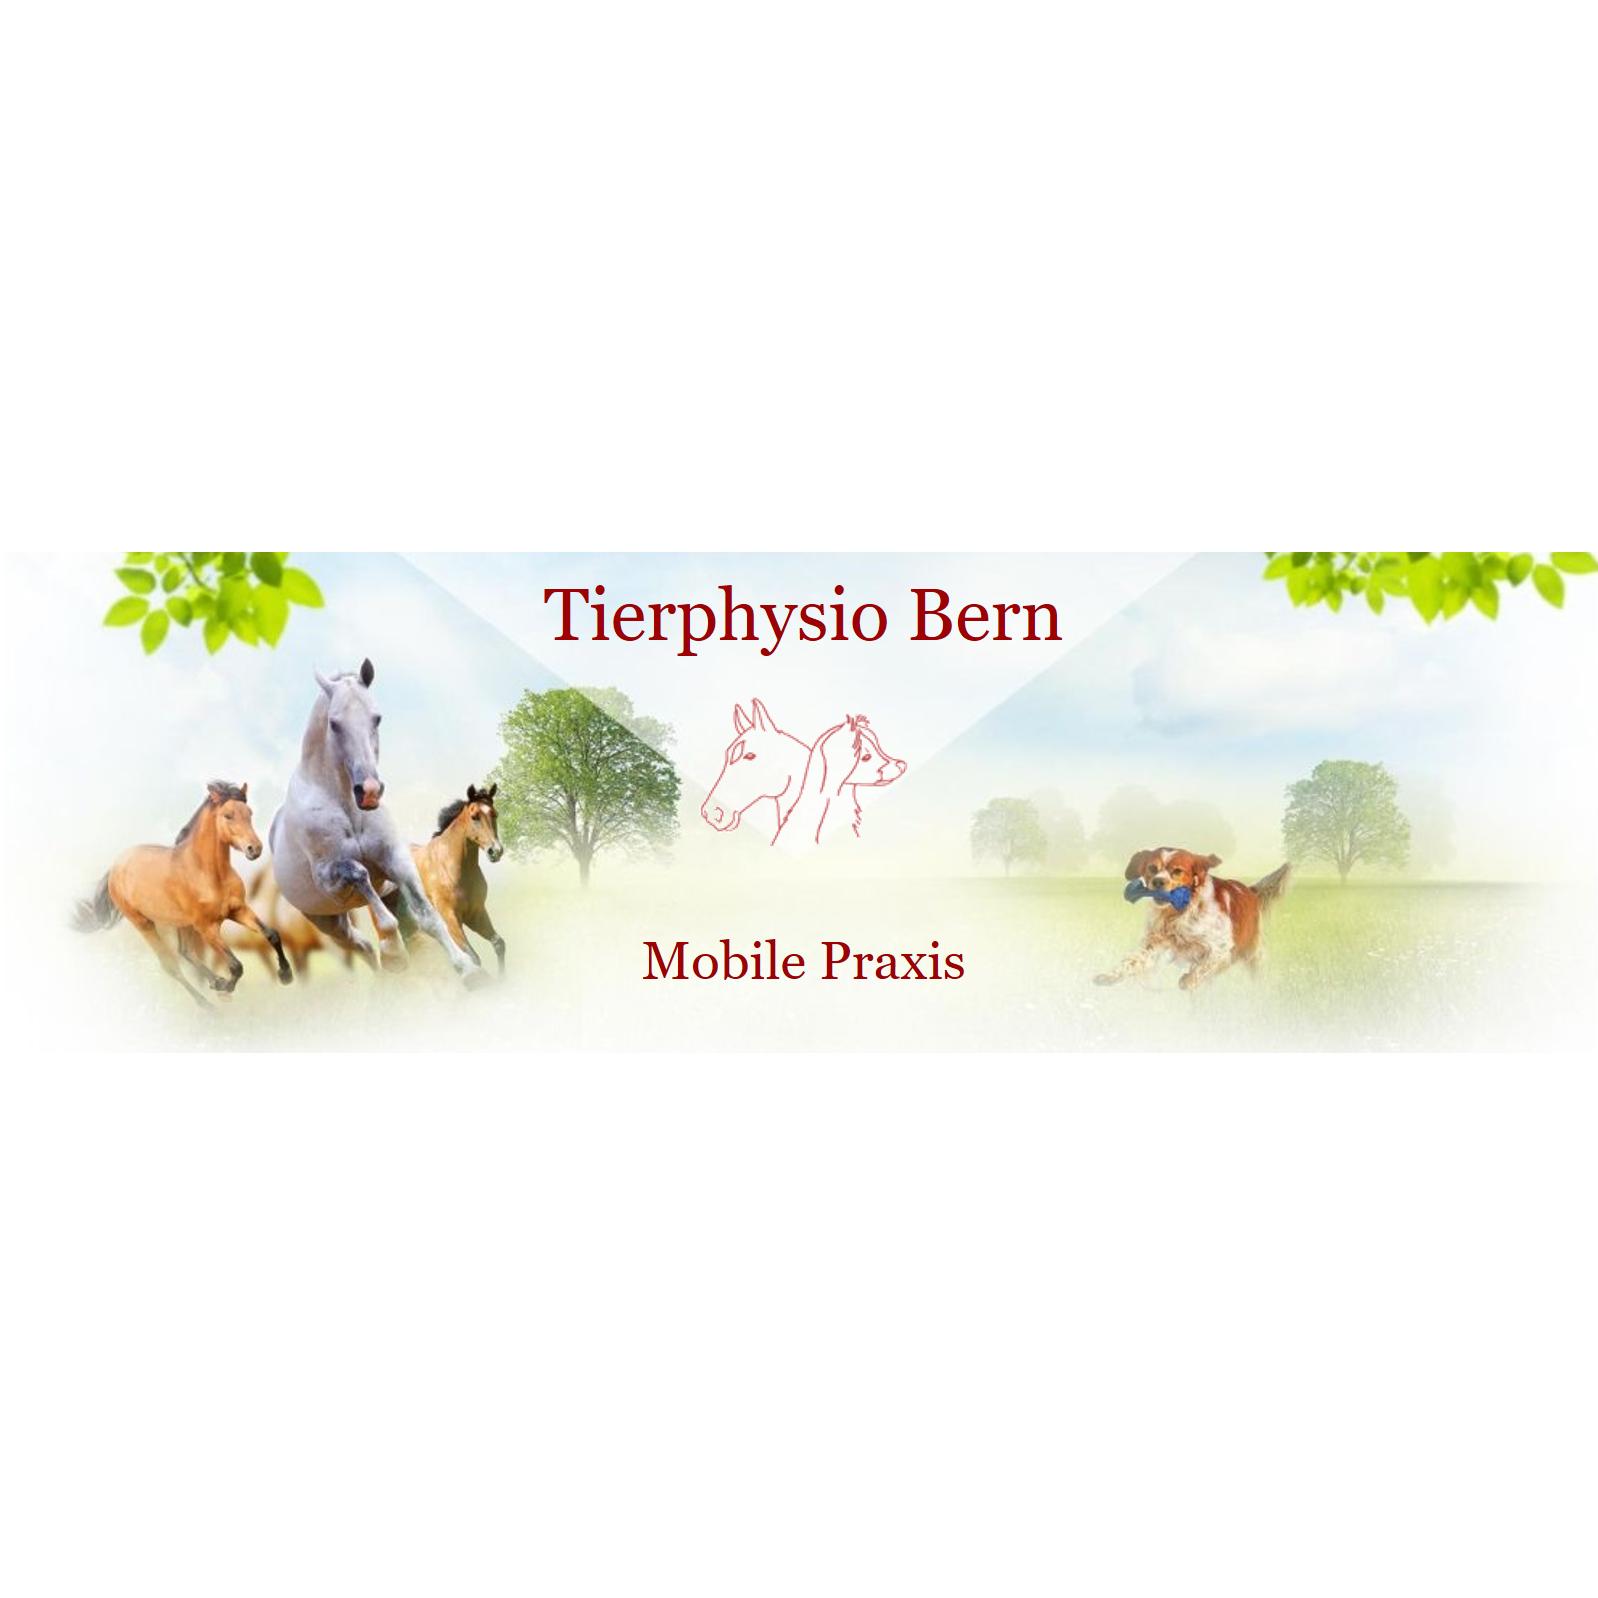 Tierphysio-Bern